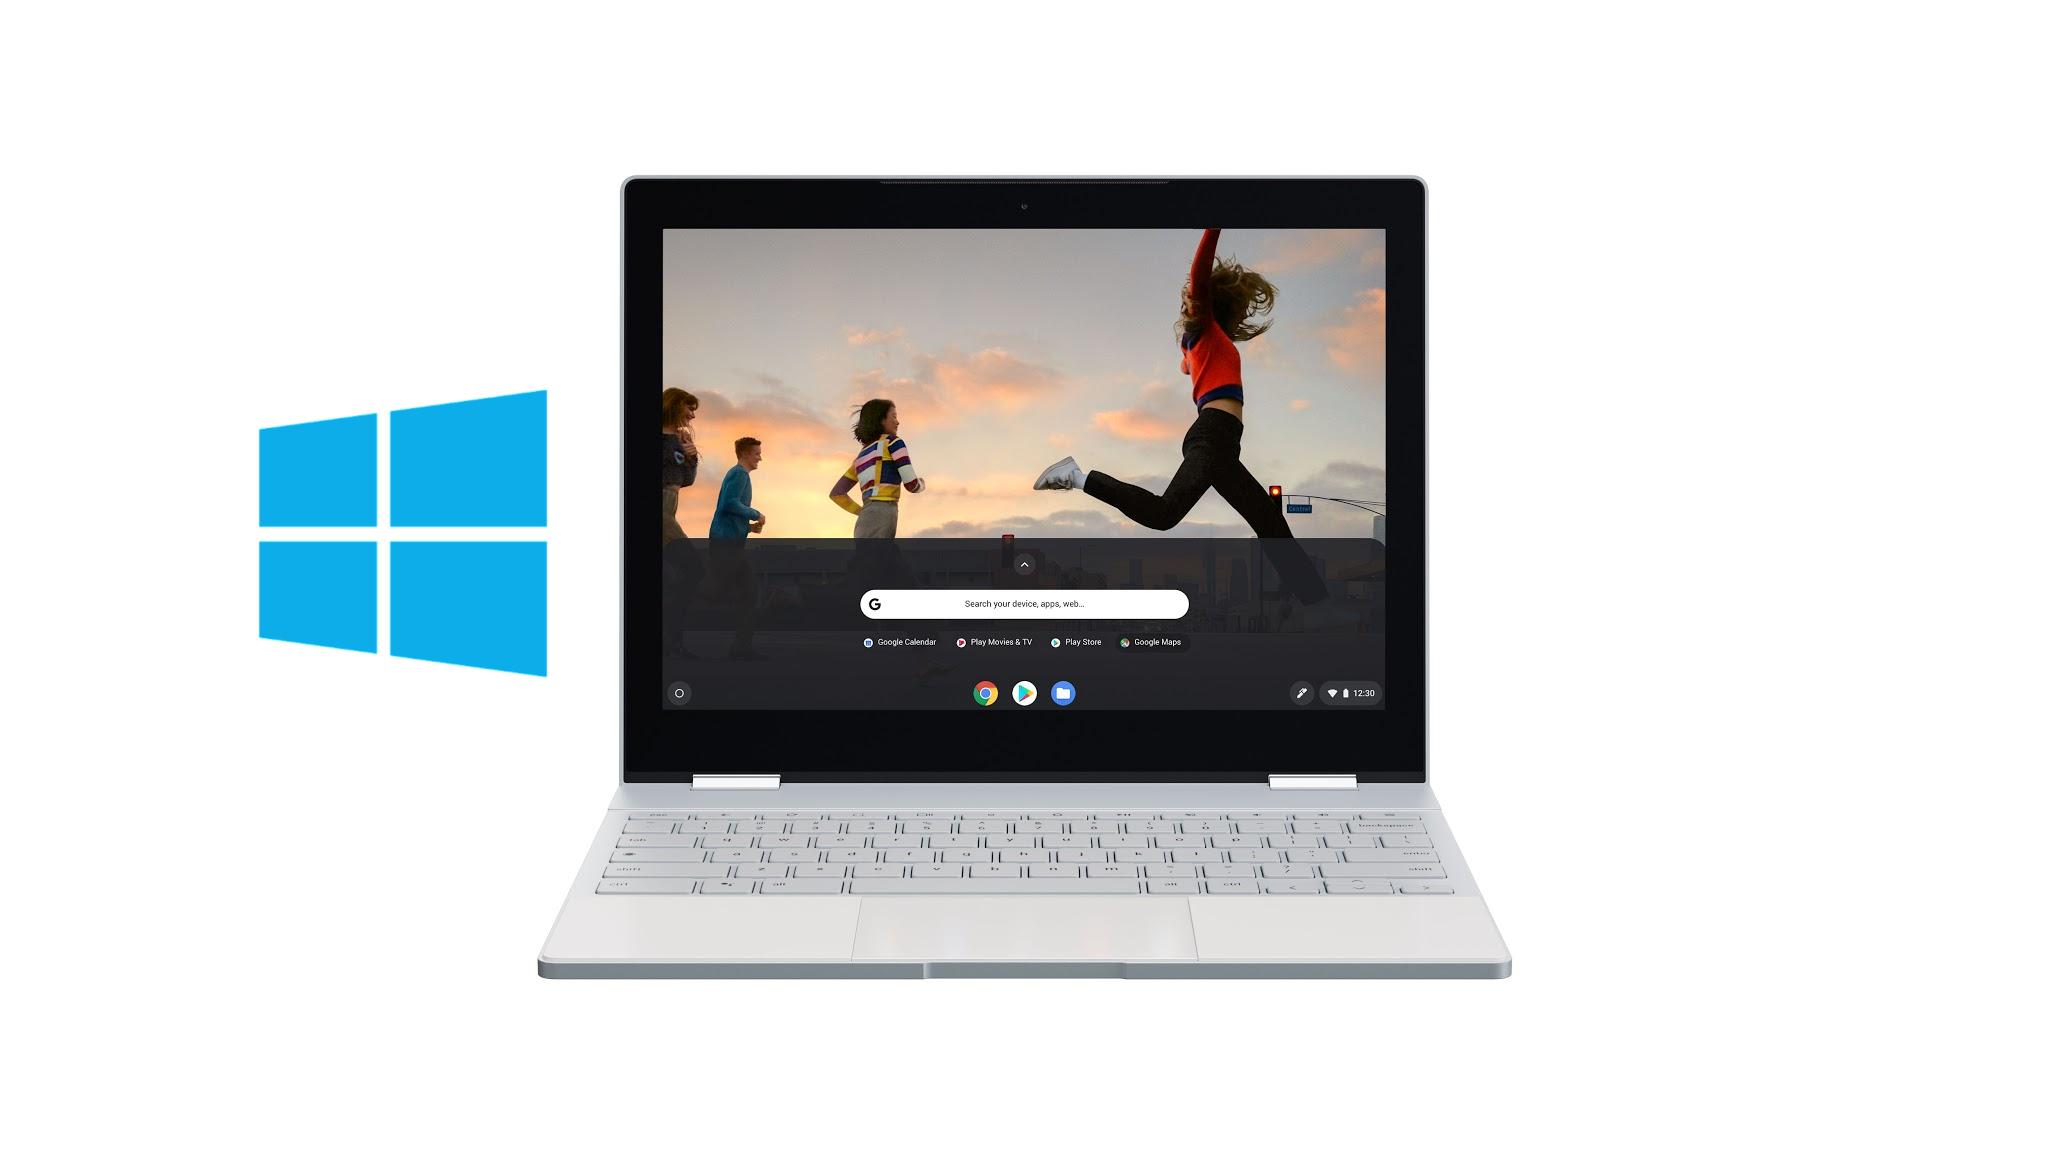 Install Windows 10 on Google Pixelbook